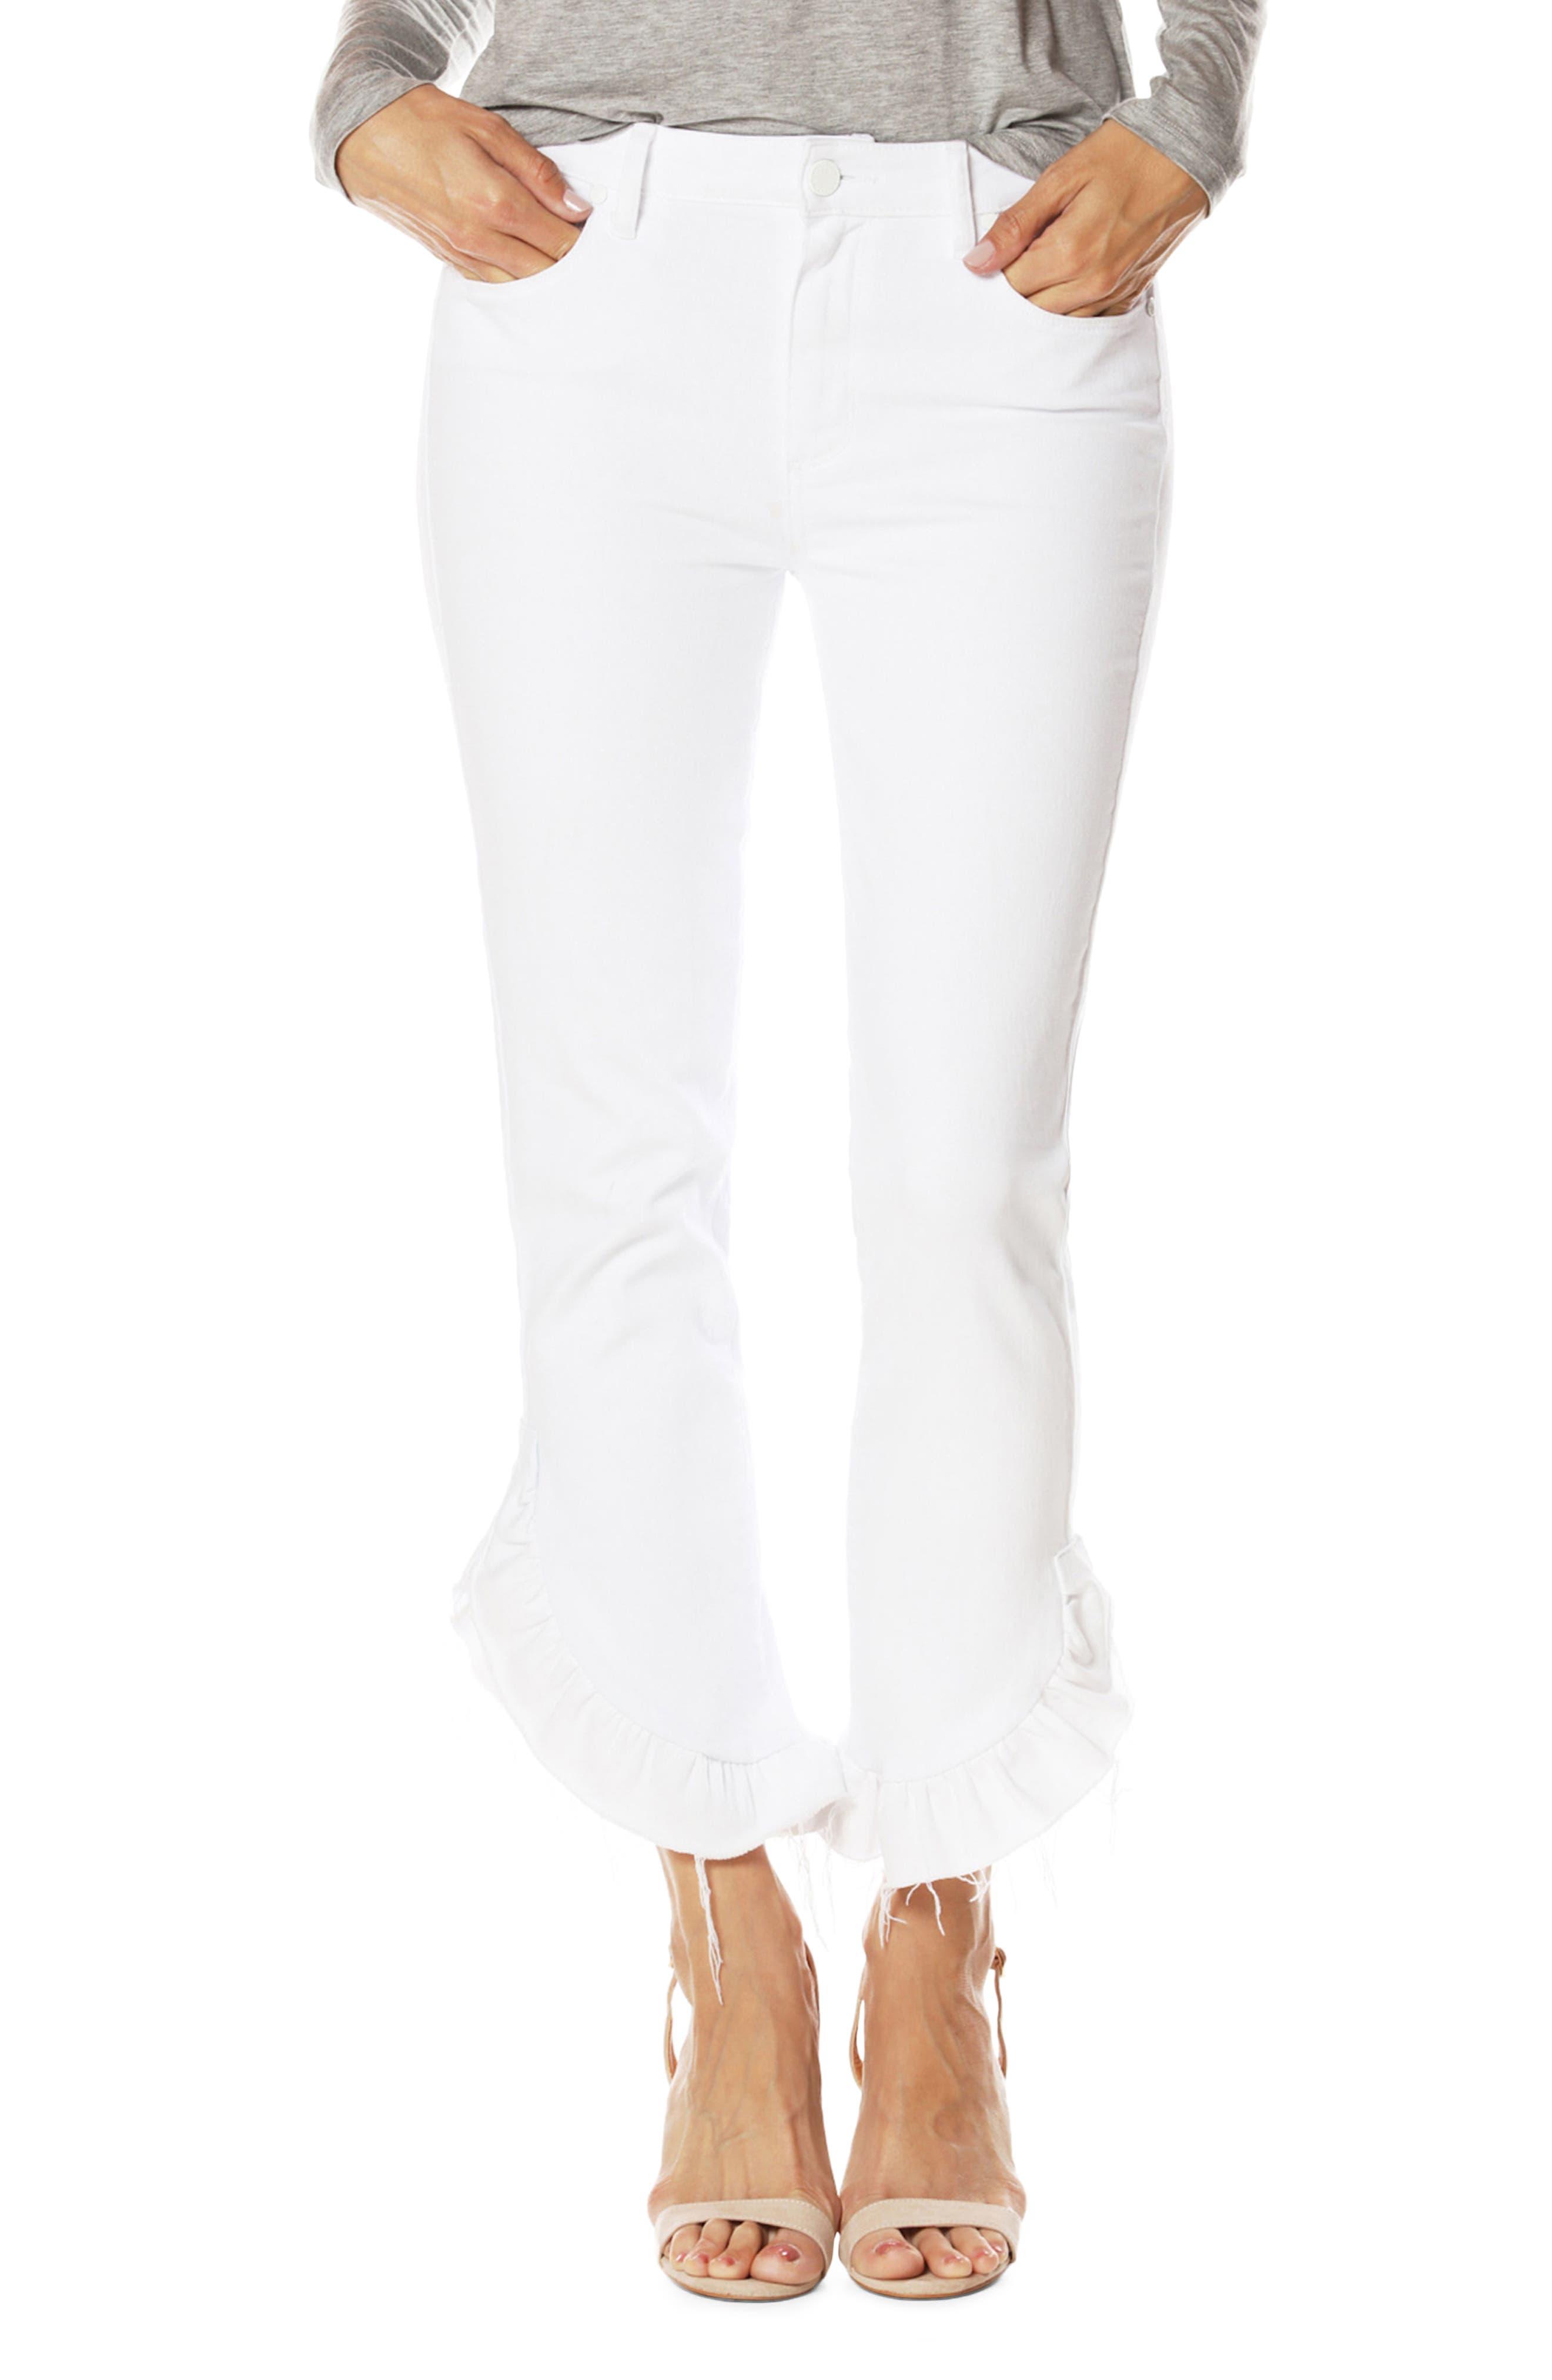 Alternate Image 1 Selected - PAIGE Jacqueline Crop Straight Leg Jeans (Crisp White)